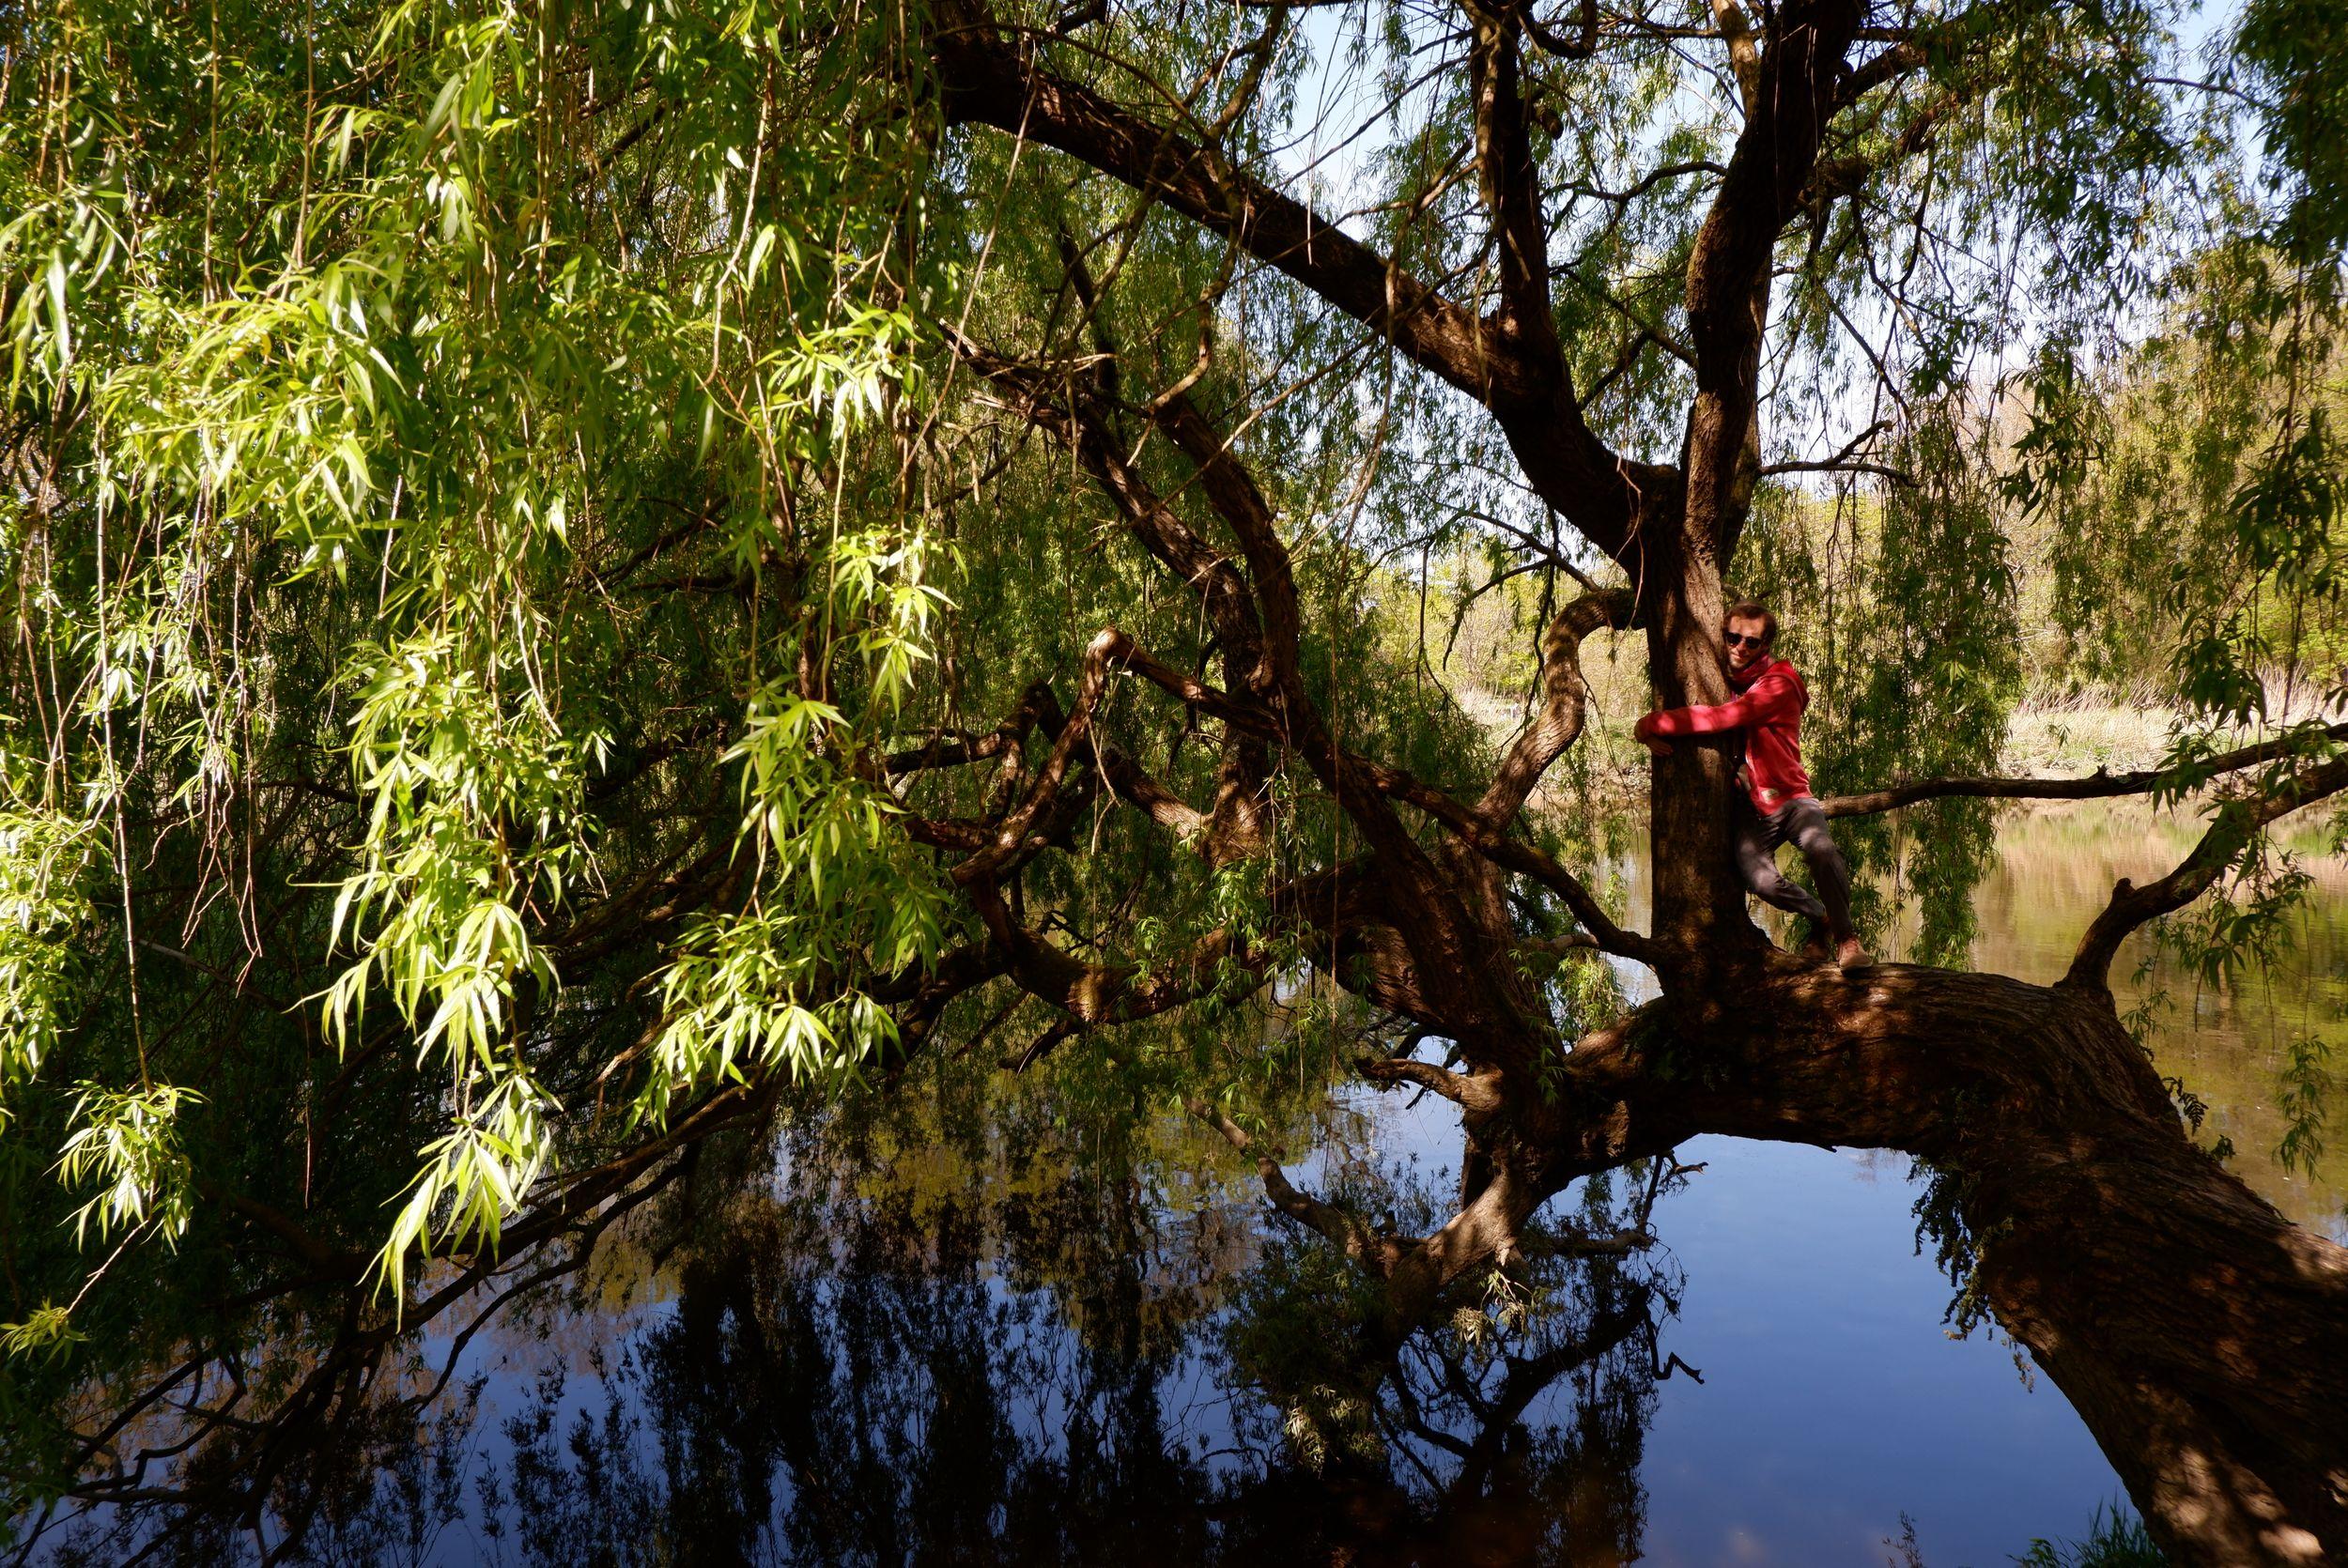 Ryan perché sur un arbre